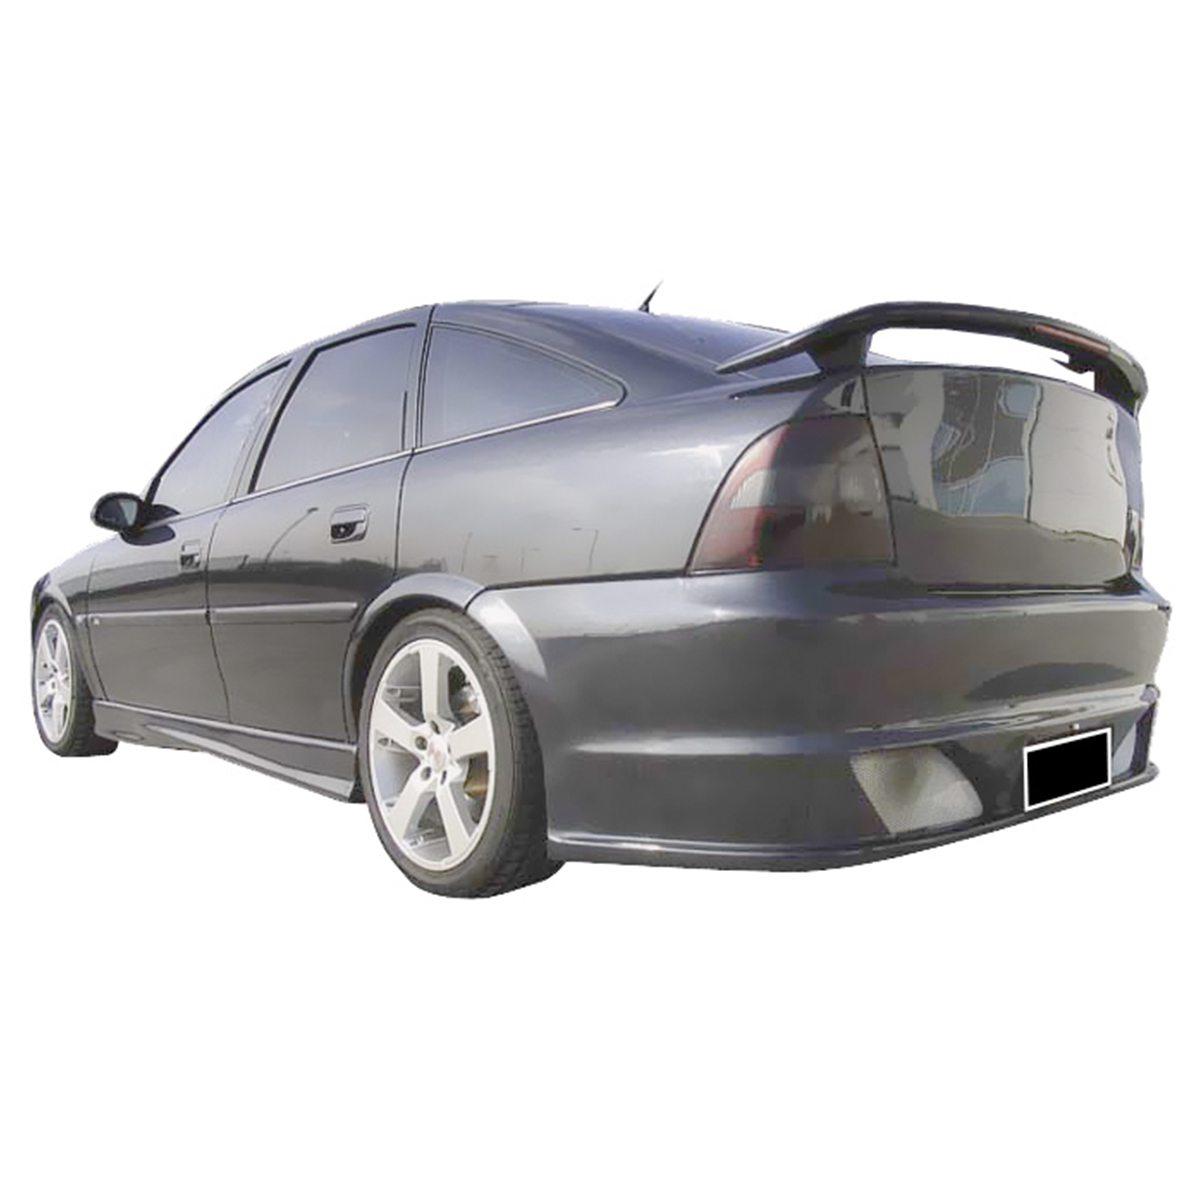 Opel-Vectra-B-Effect-tras-PCA070